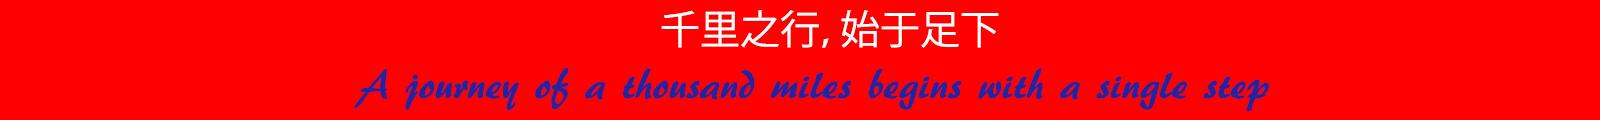 motto-banner